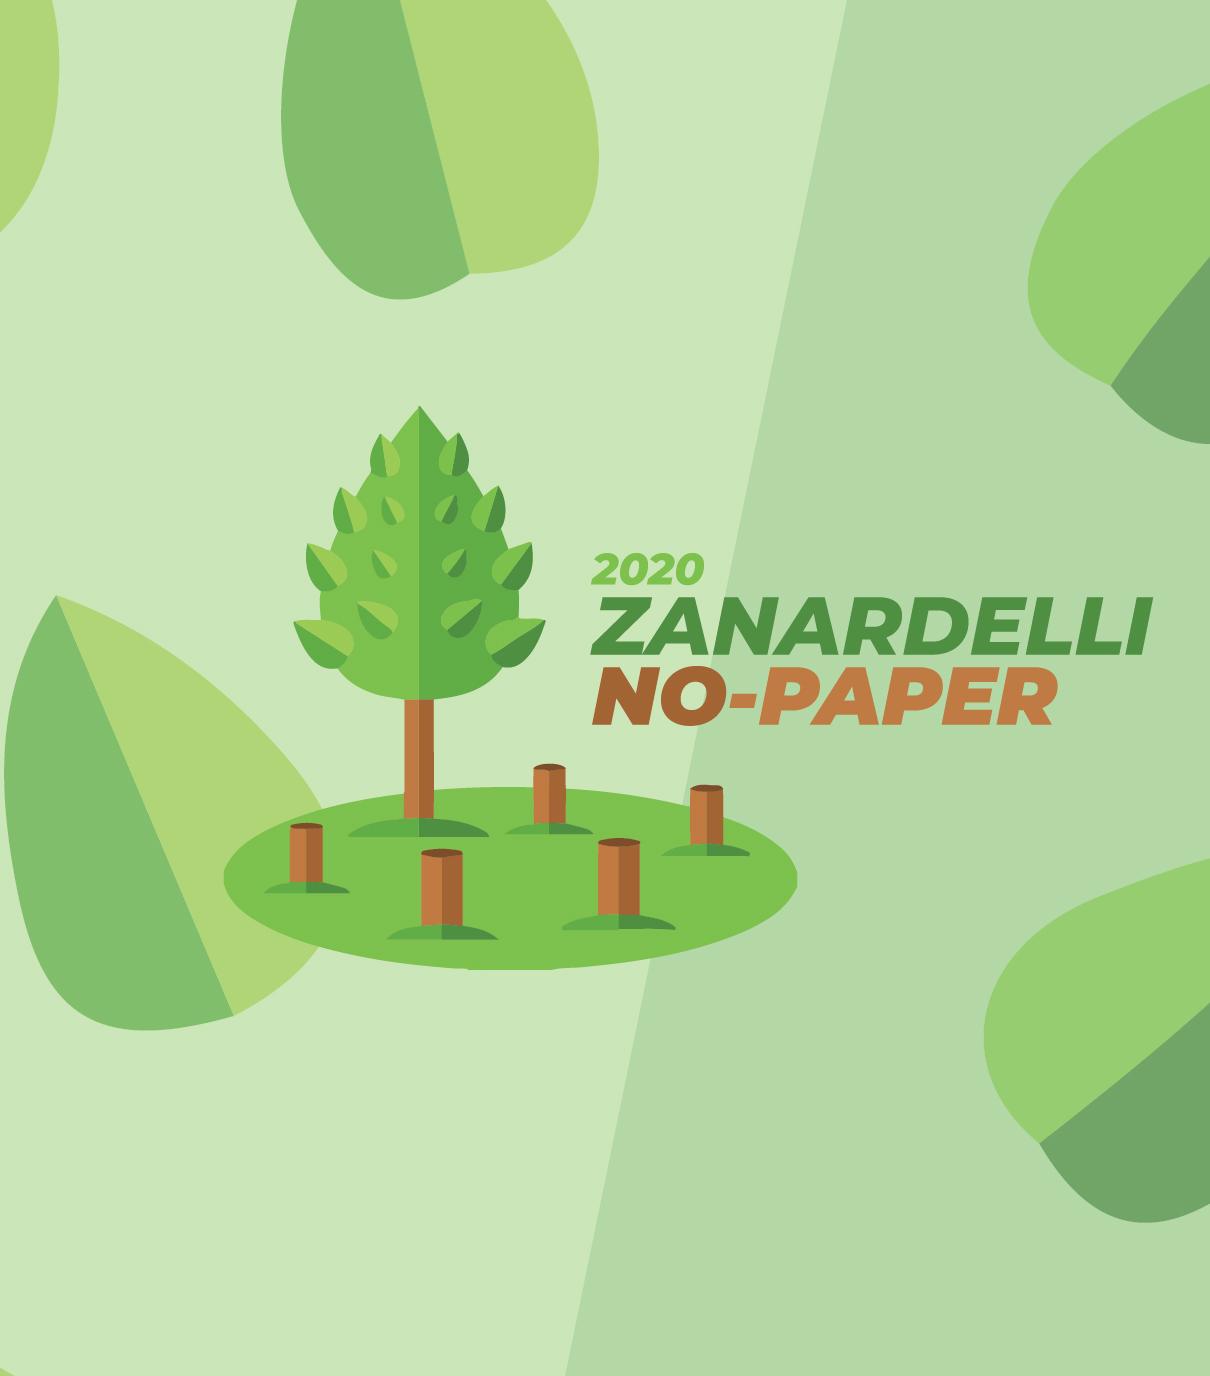 Zanardelli No-Paper 1